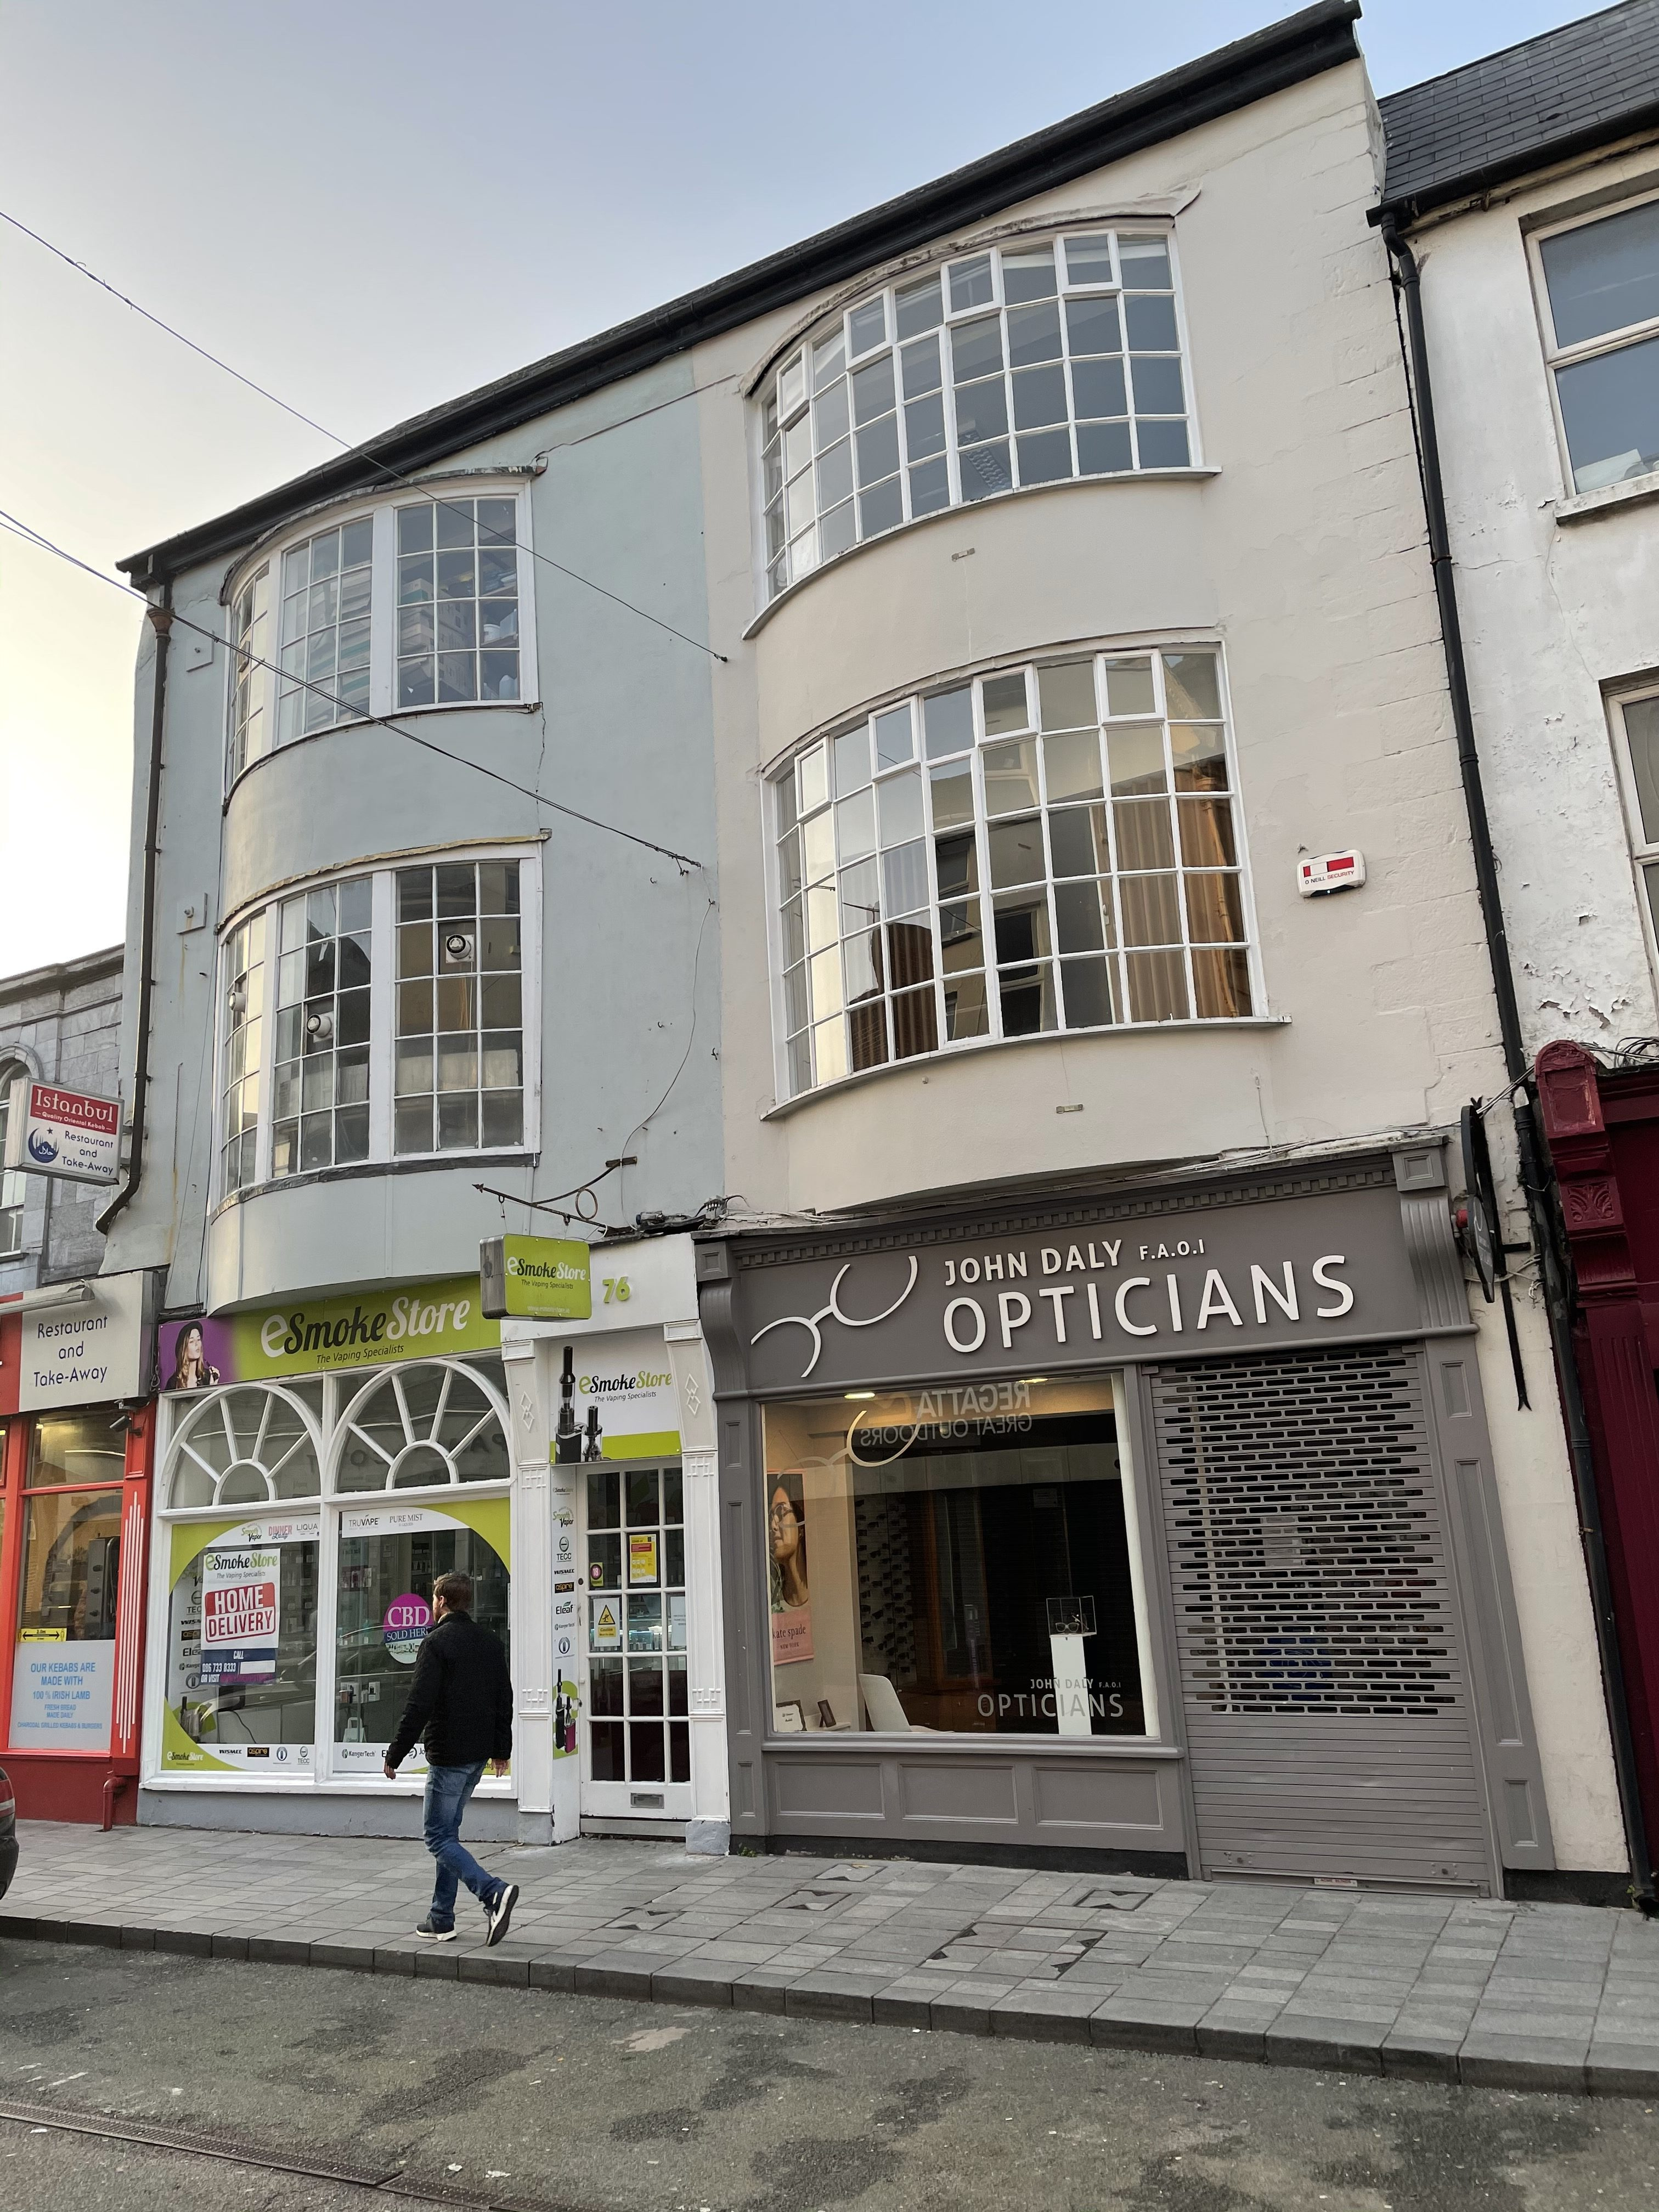 A pair of terraced single-bay three-storey houses, c. 1810, having a two-storey bowed oriel window, Oliver Plunkett Street, Cork, present day (picture: Kieran McCarthy)